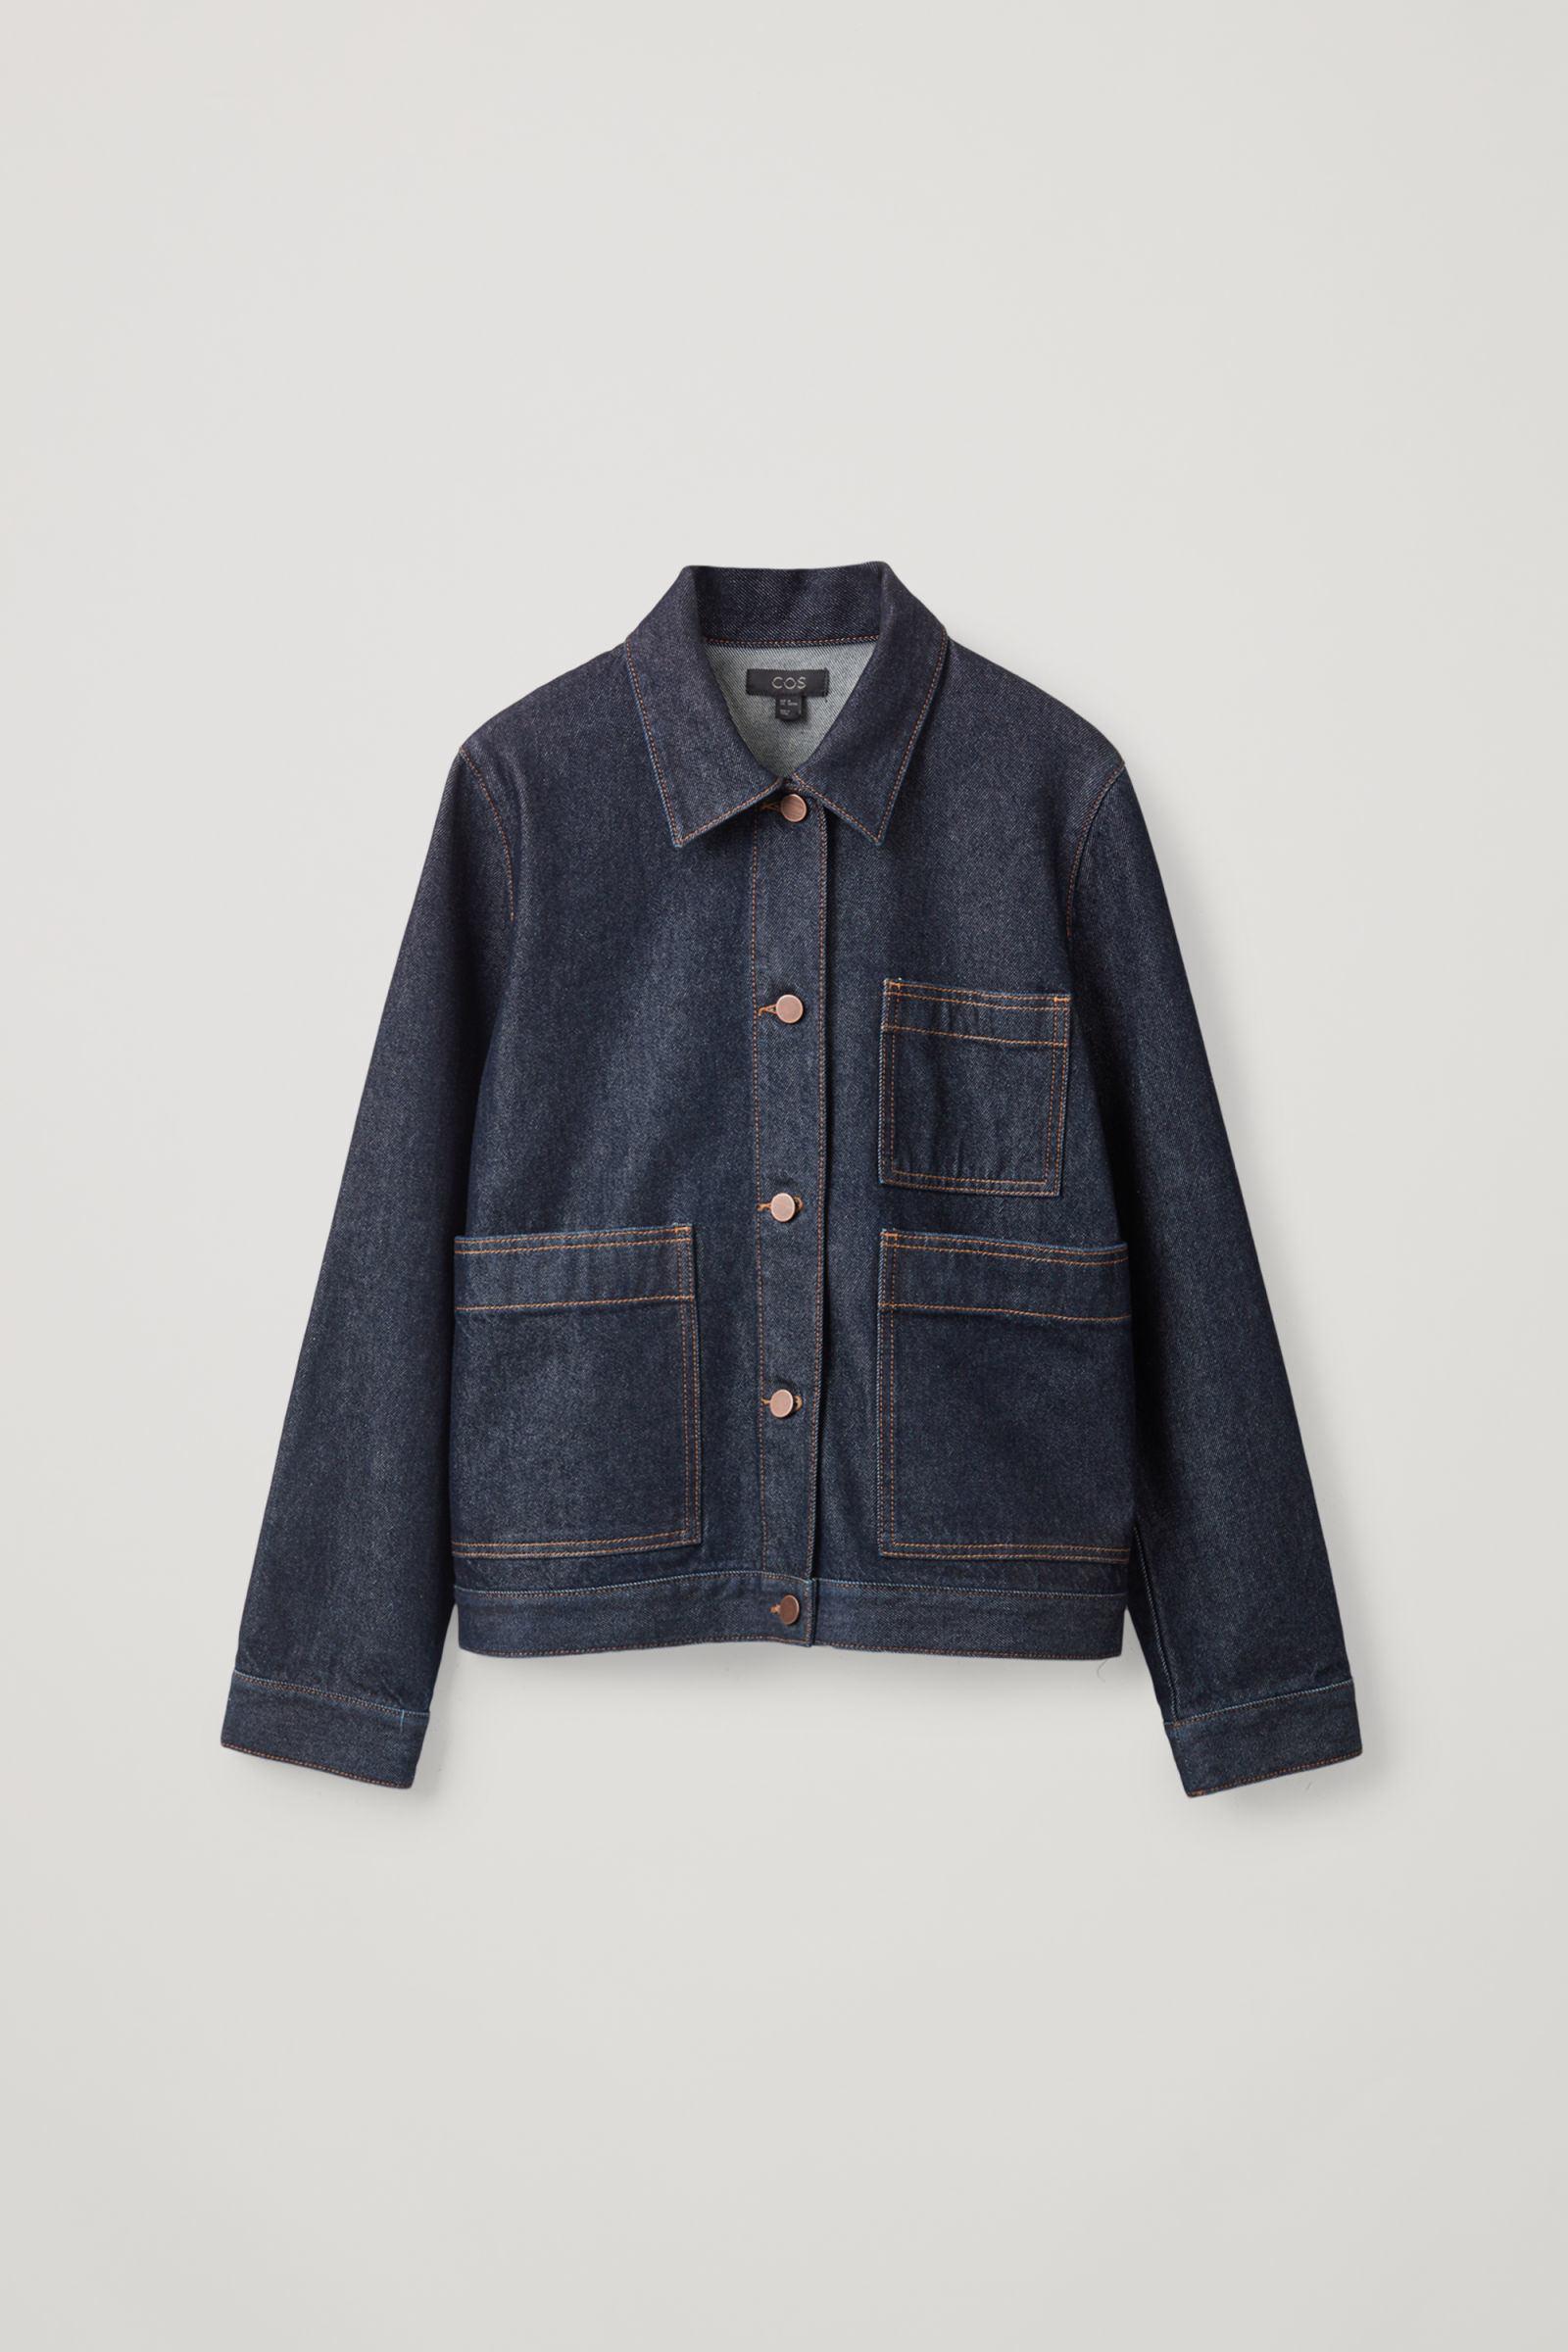 COS 패치 포켓 데님 재킷의 다크 블루 / 토바코컬러 상품컷입니다.